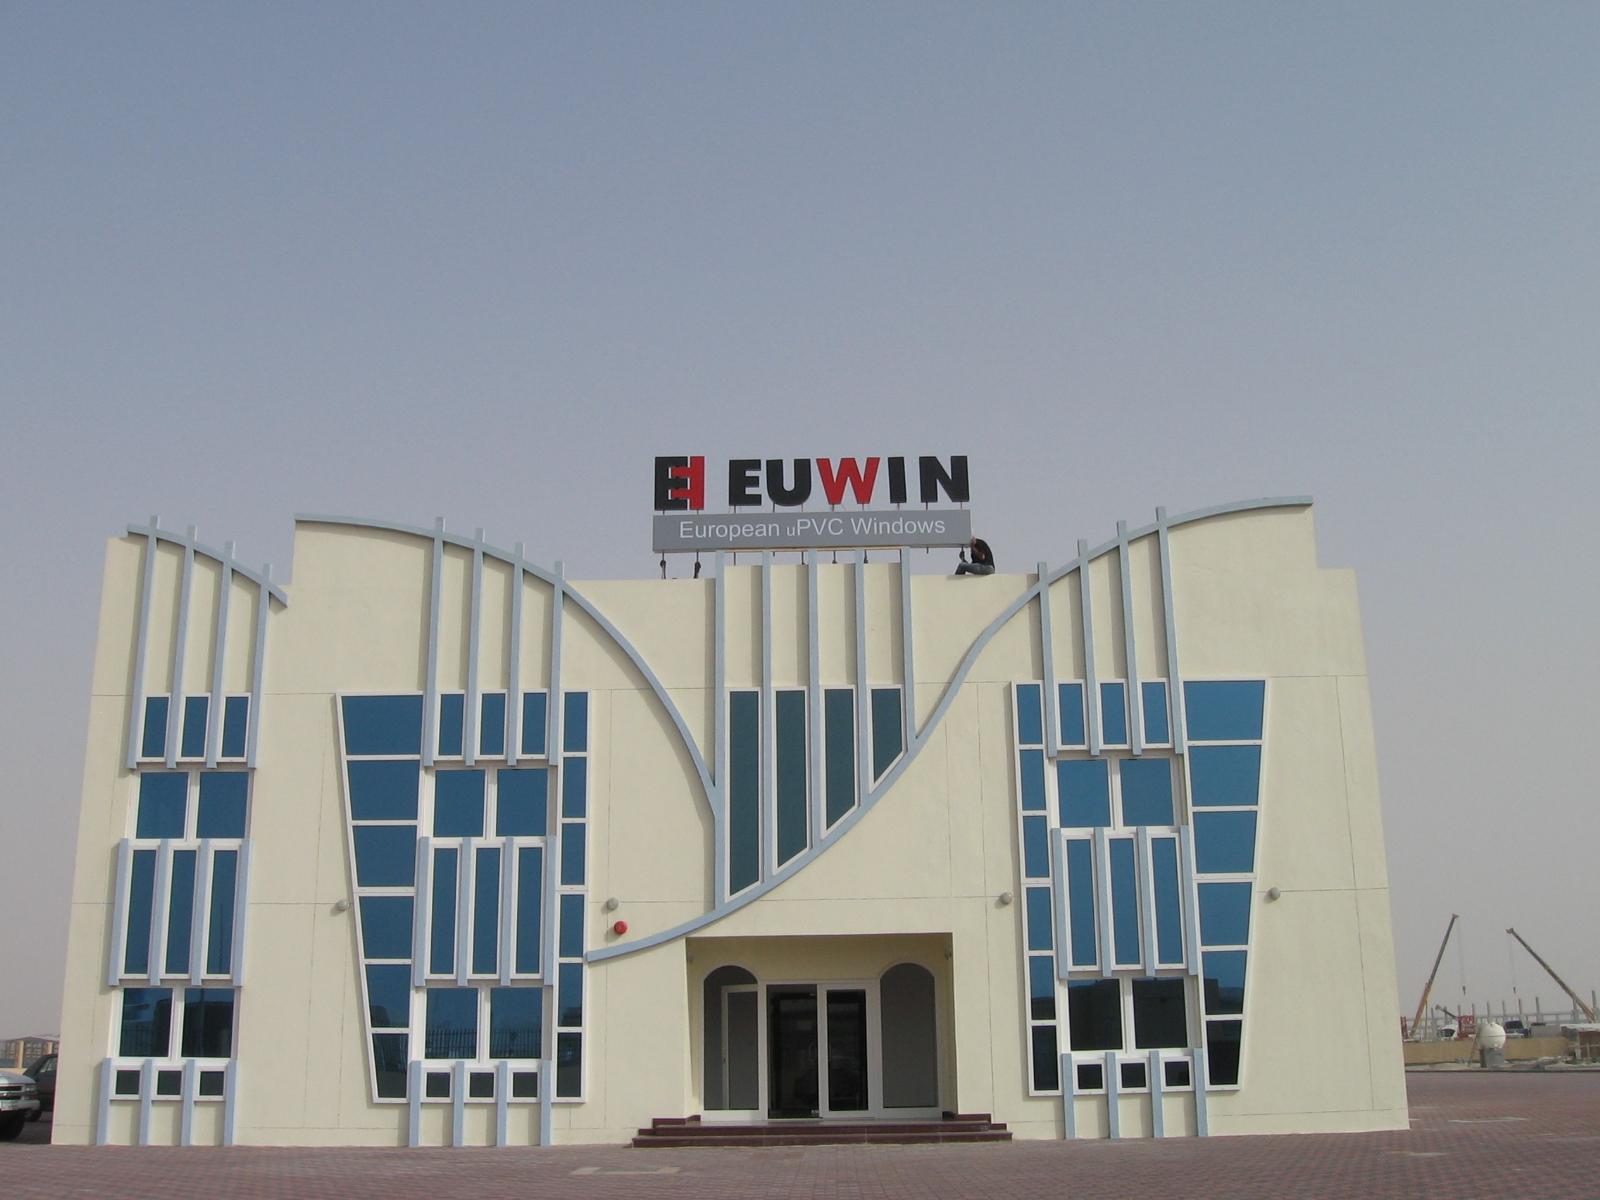 Euwin